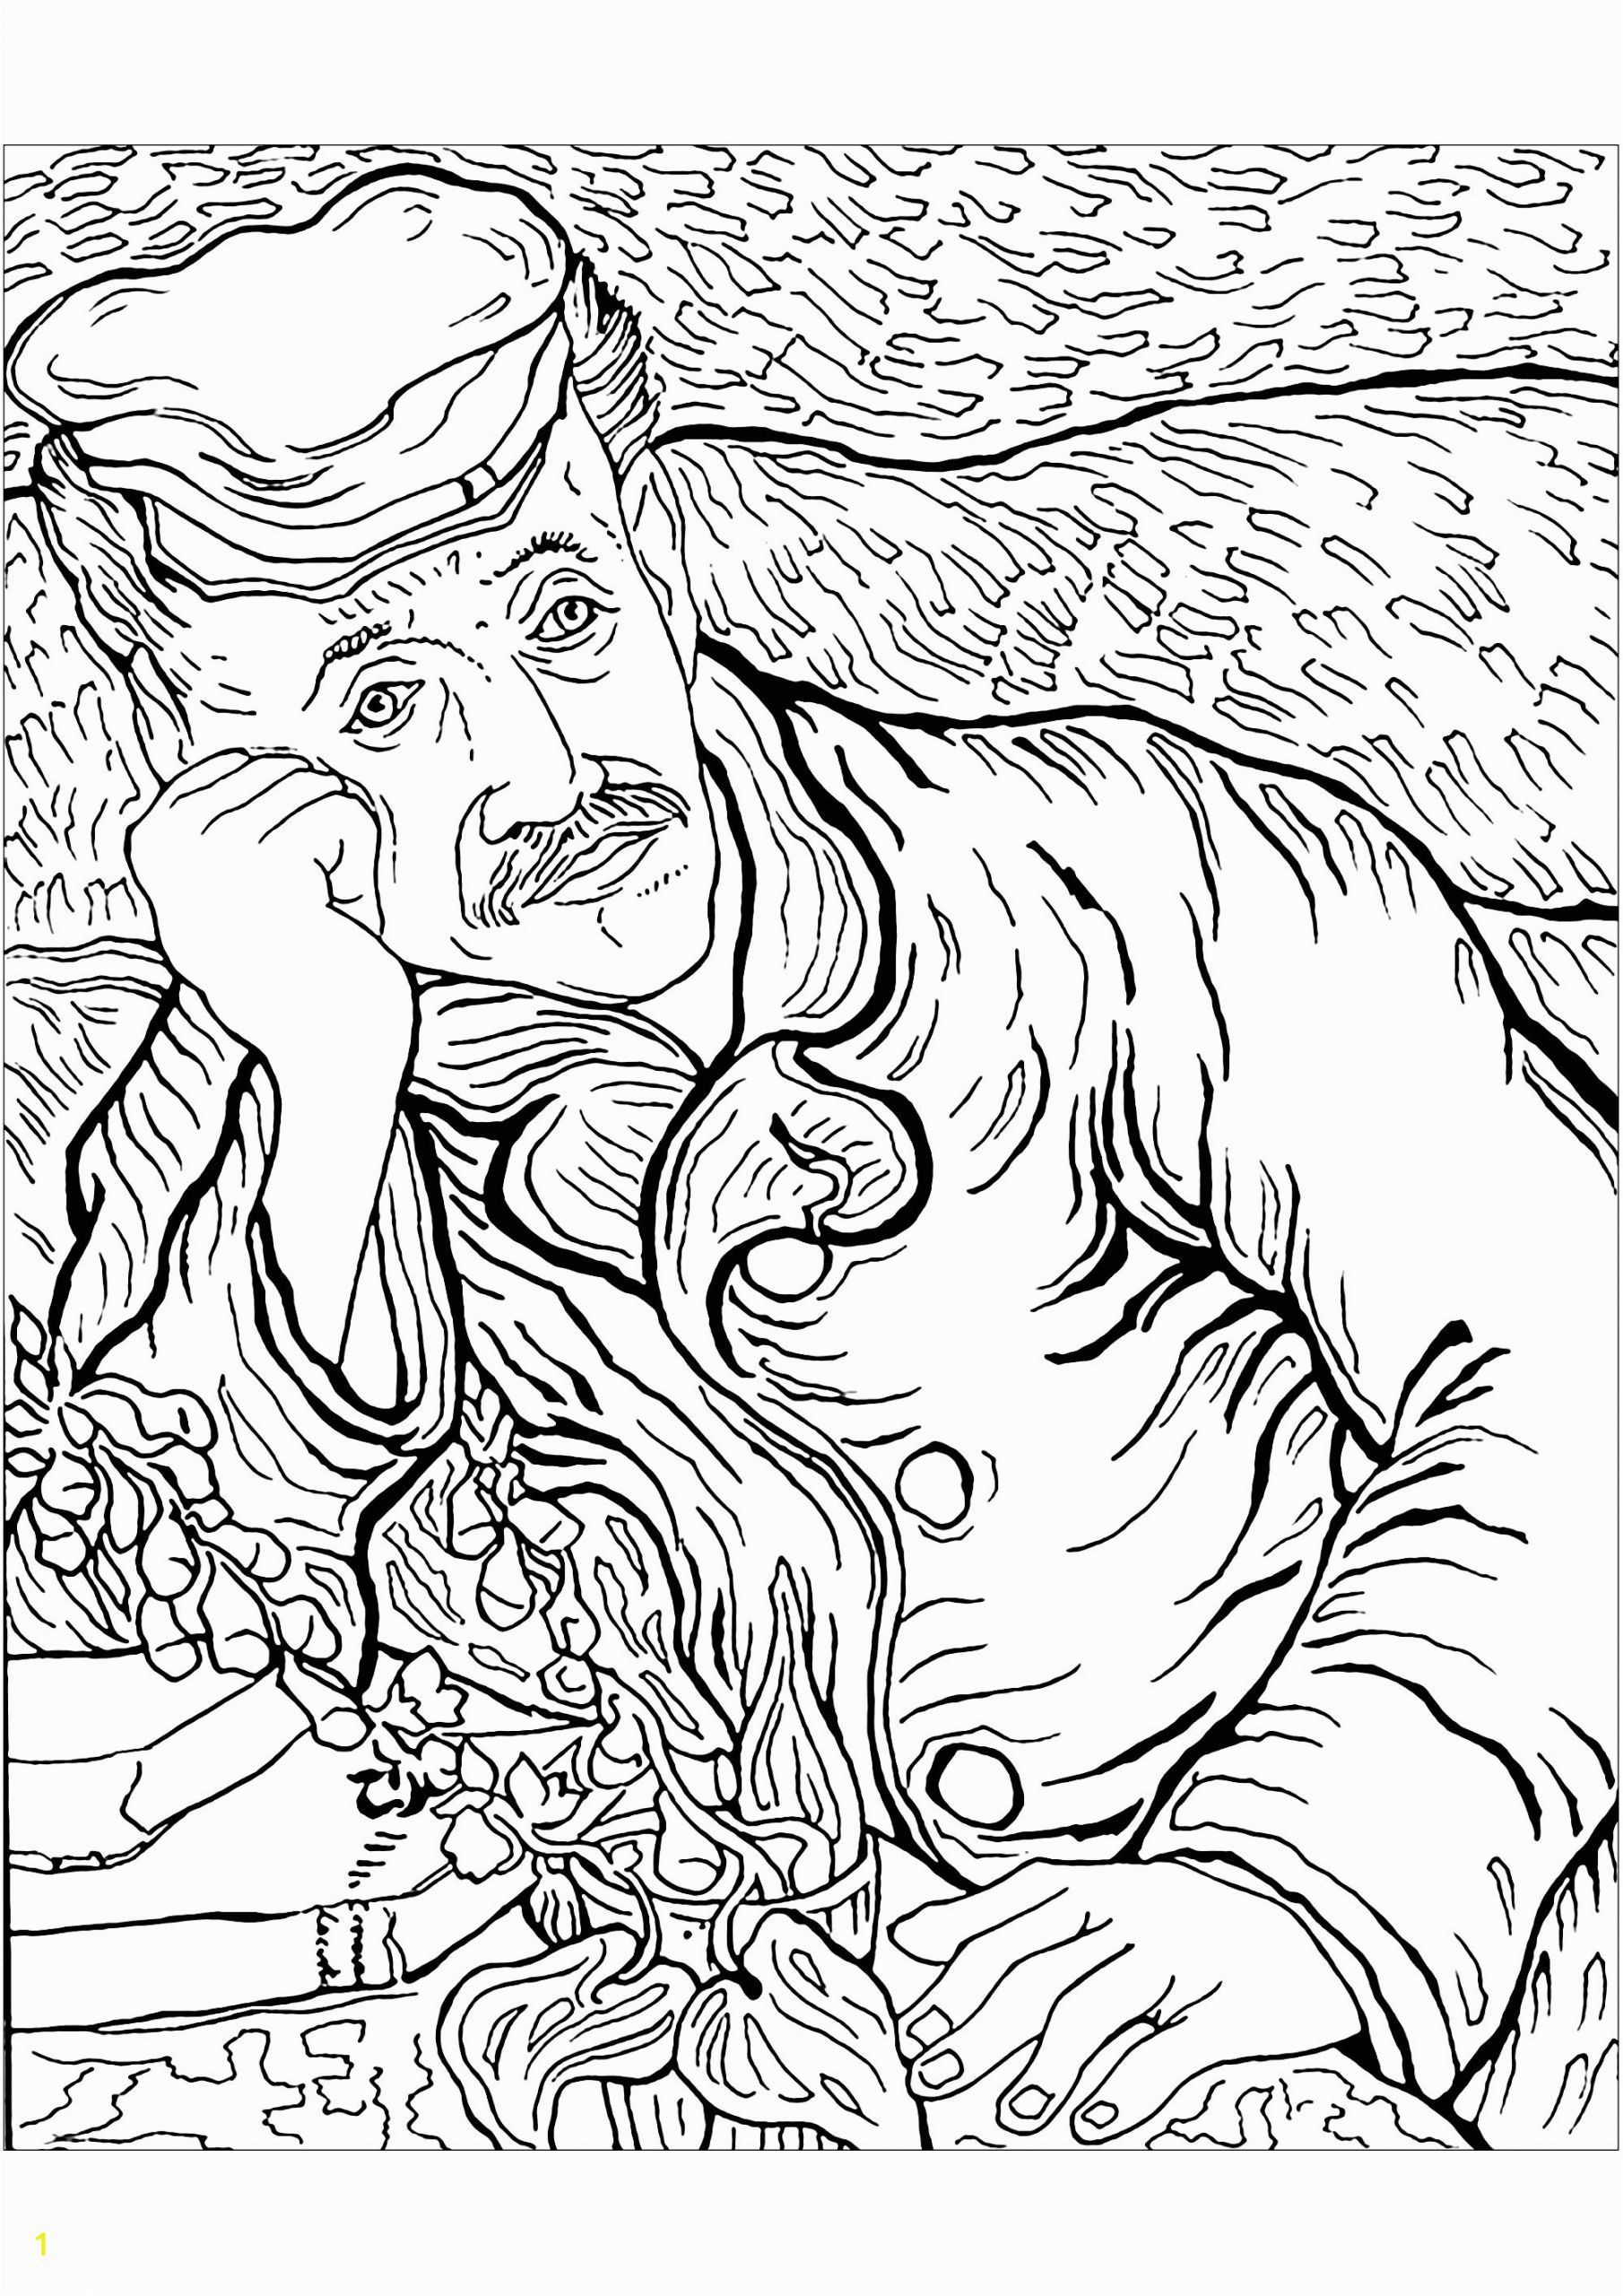 image=van gogh coloring pages for children vincent van gogh 1